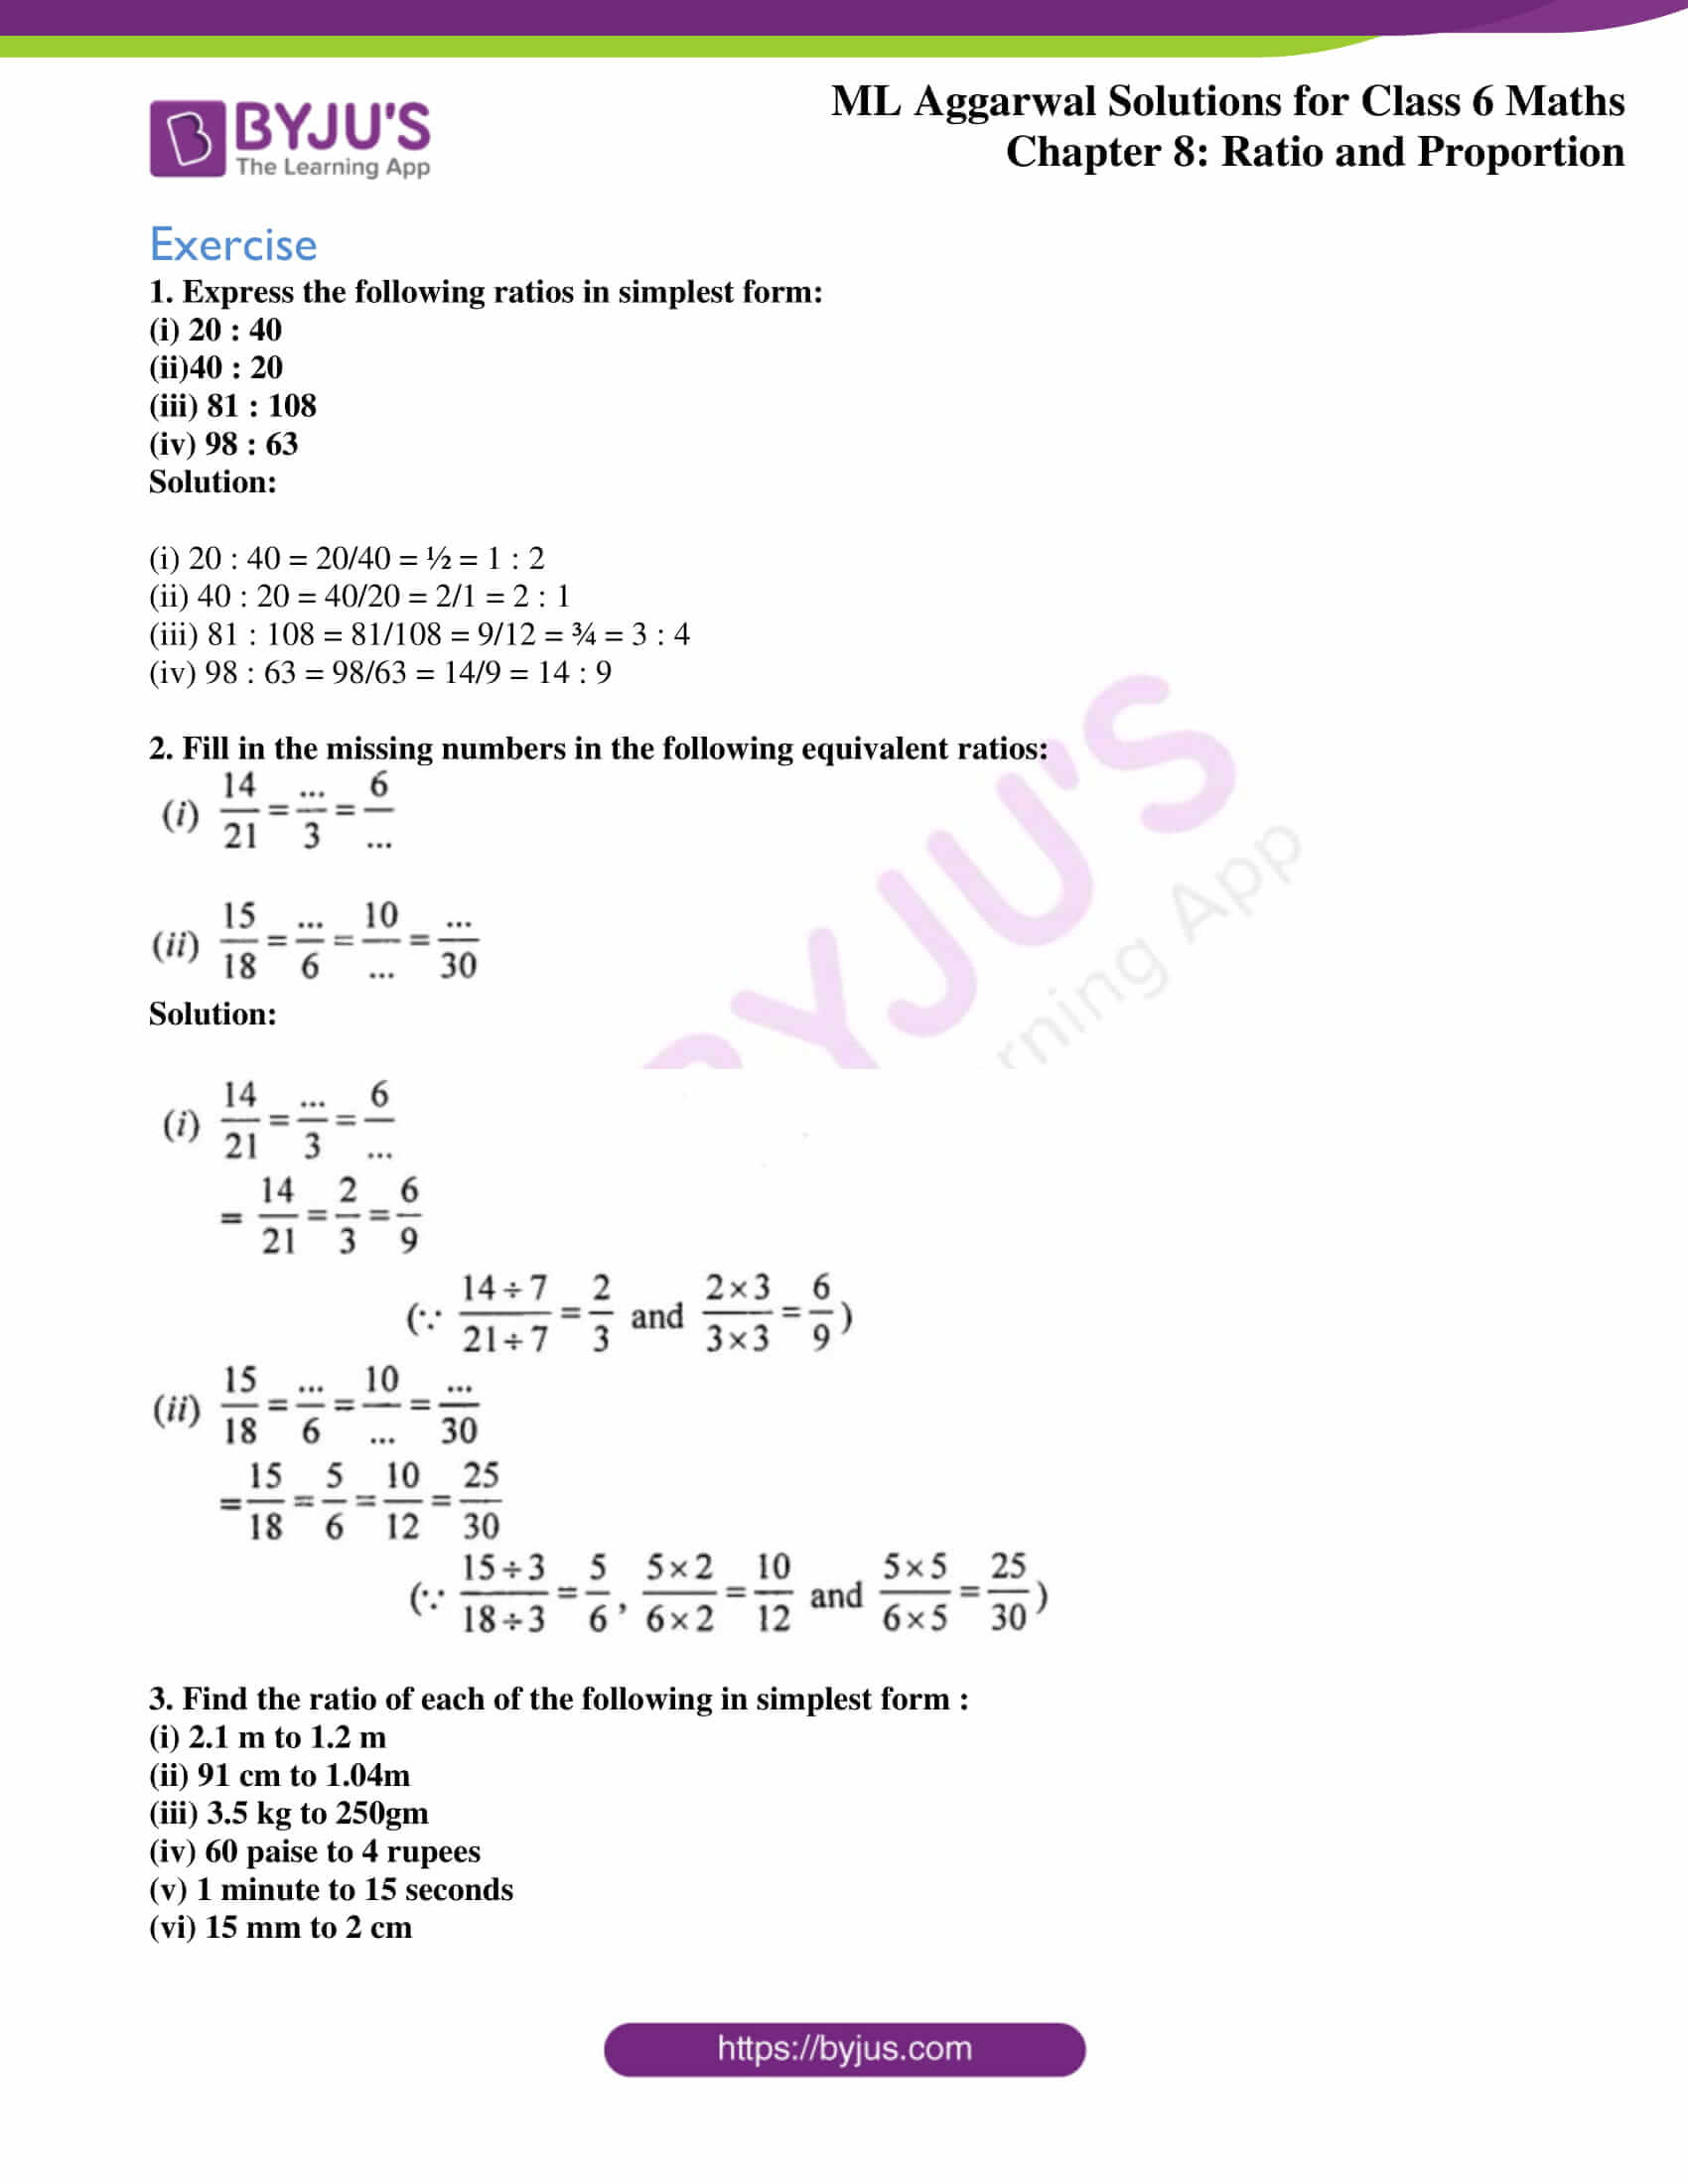 ml aggarwal sol class 6 maths chapter 8 1